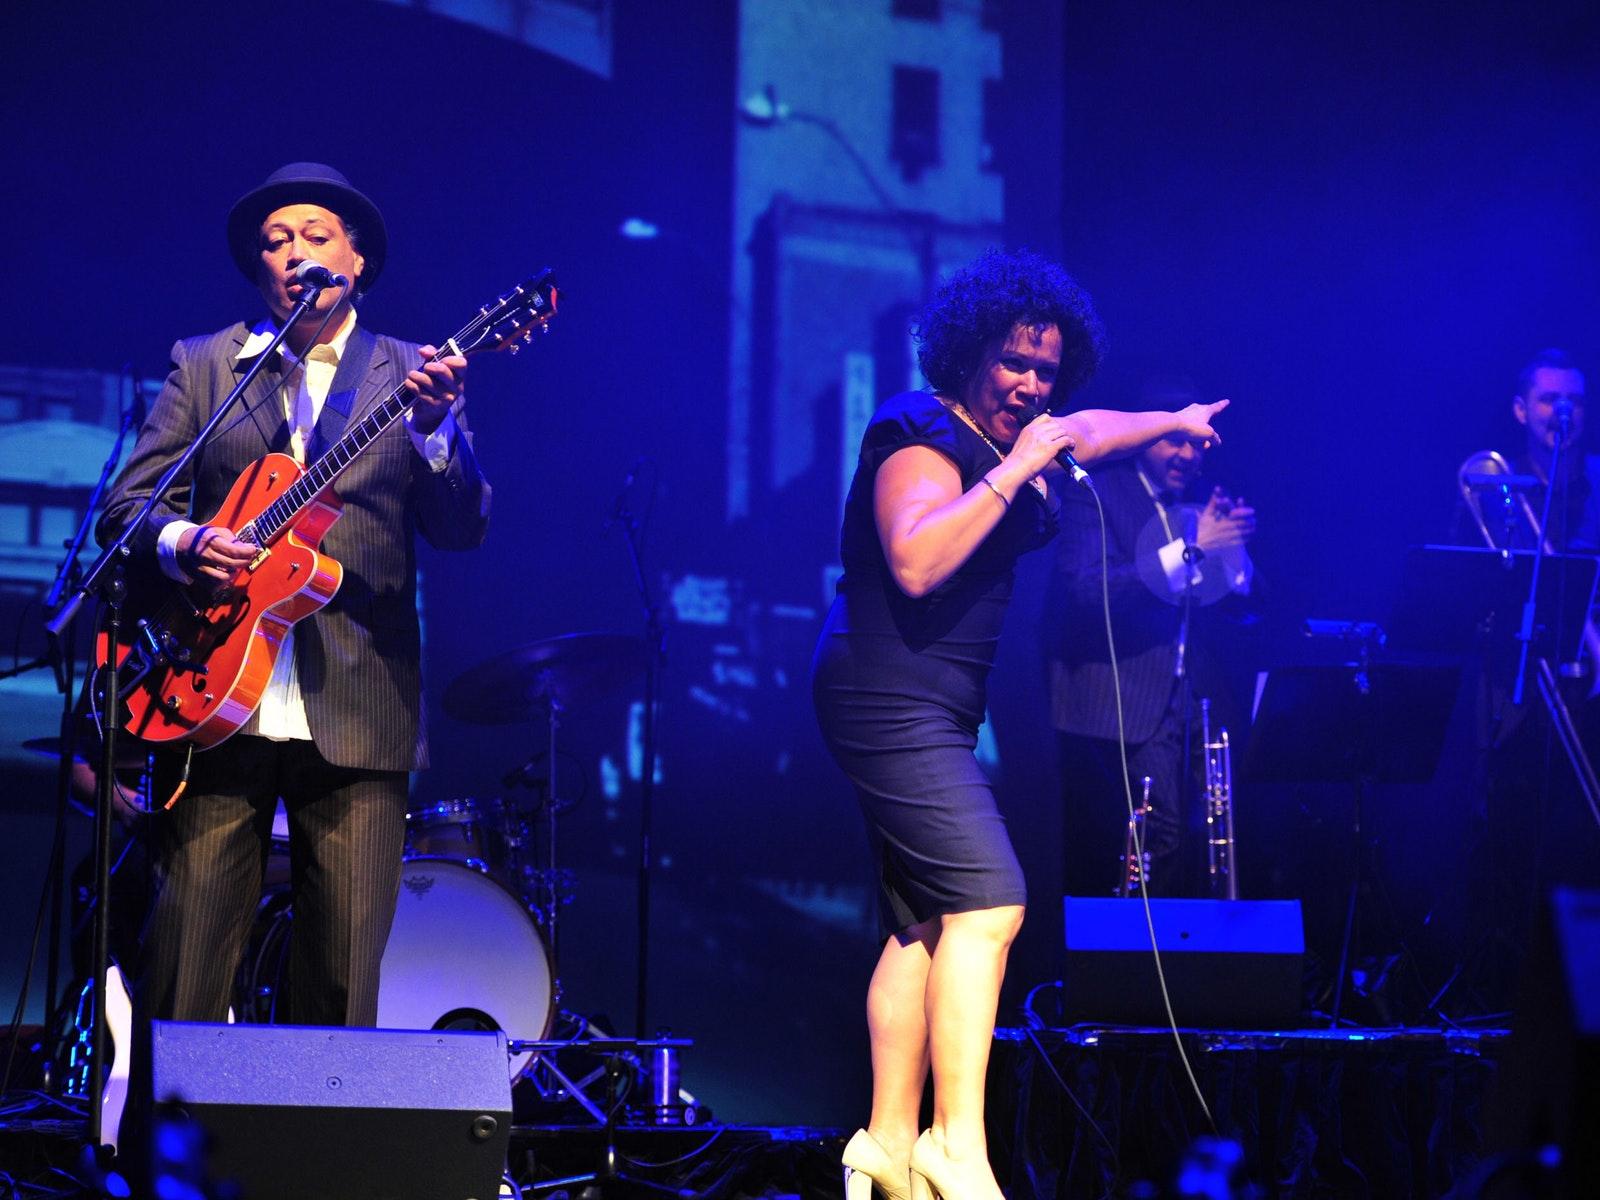 Vika Bull and The Essential R&B Band